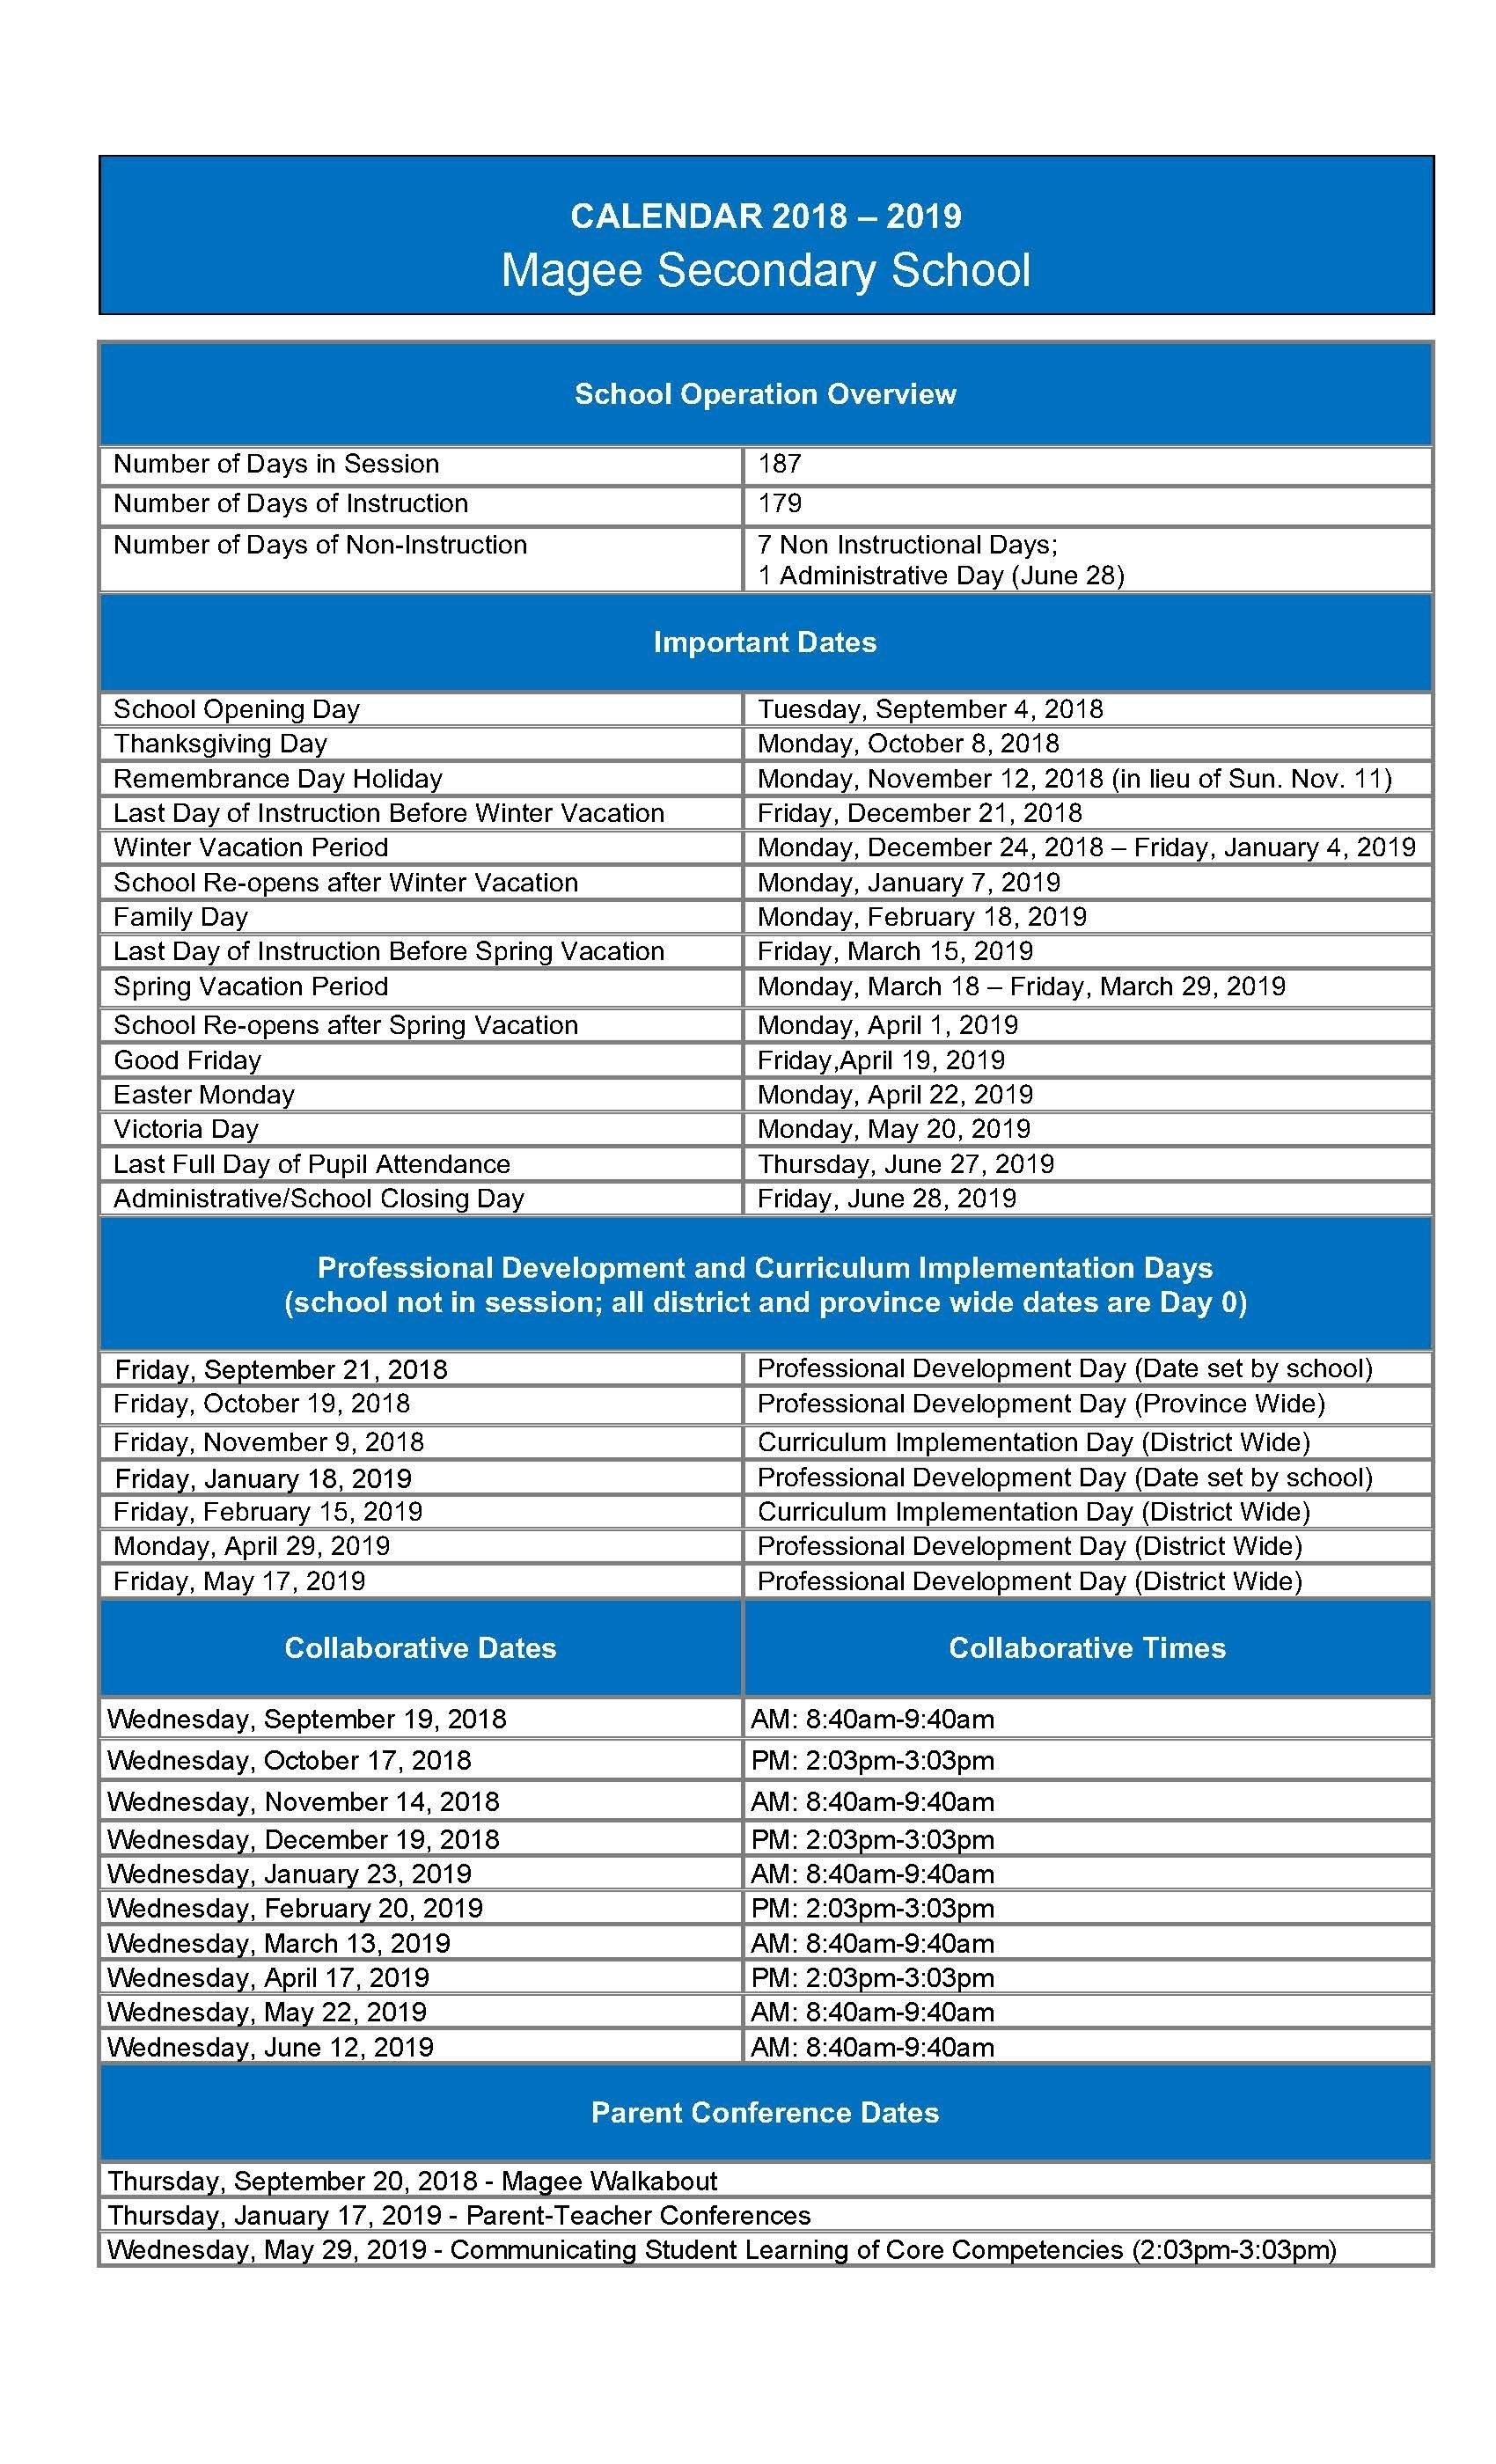 2018-2019 Magee Calendar Calendar 2019 Important Dates